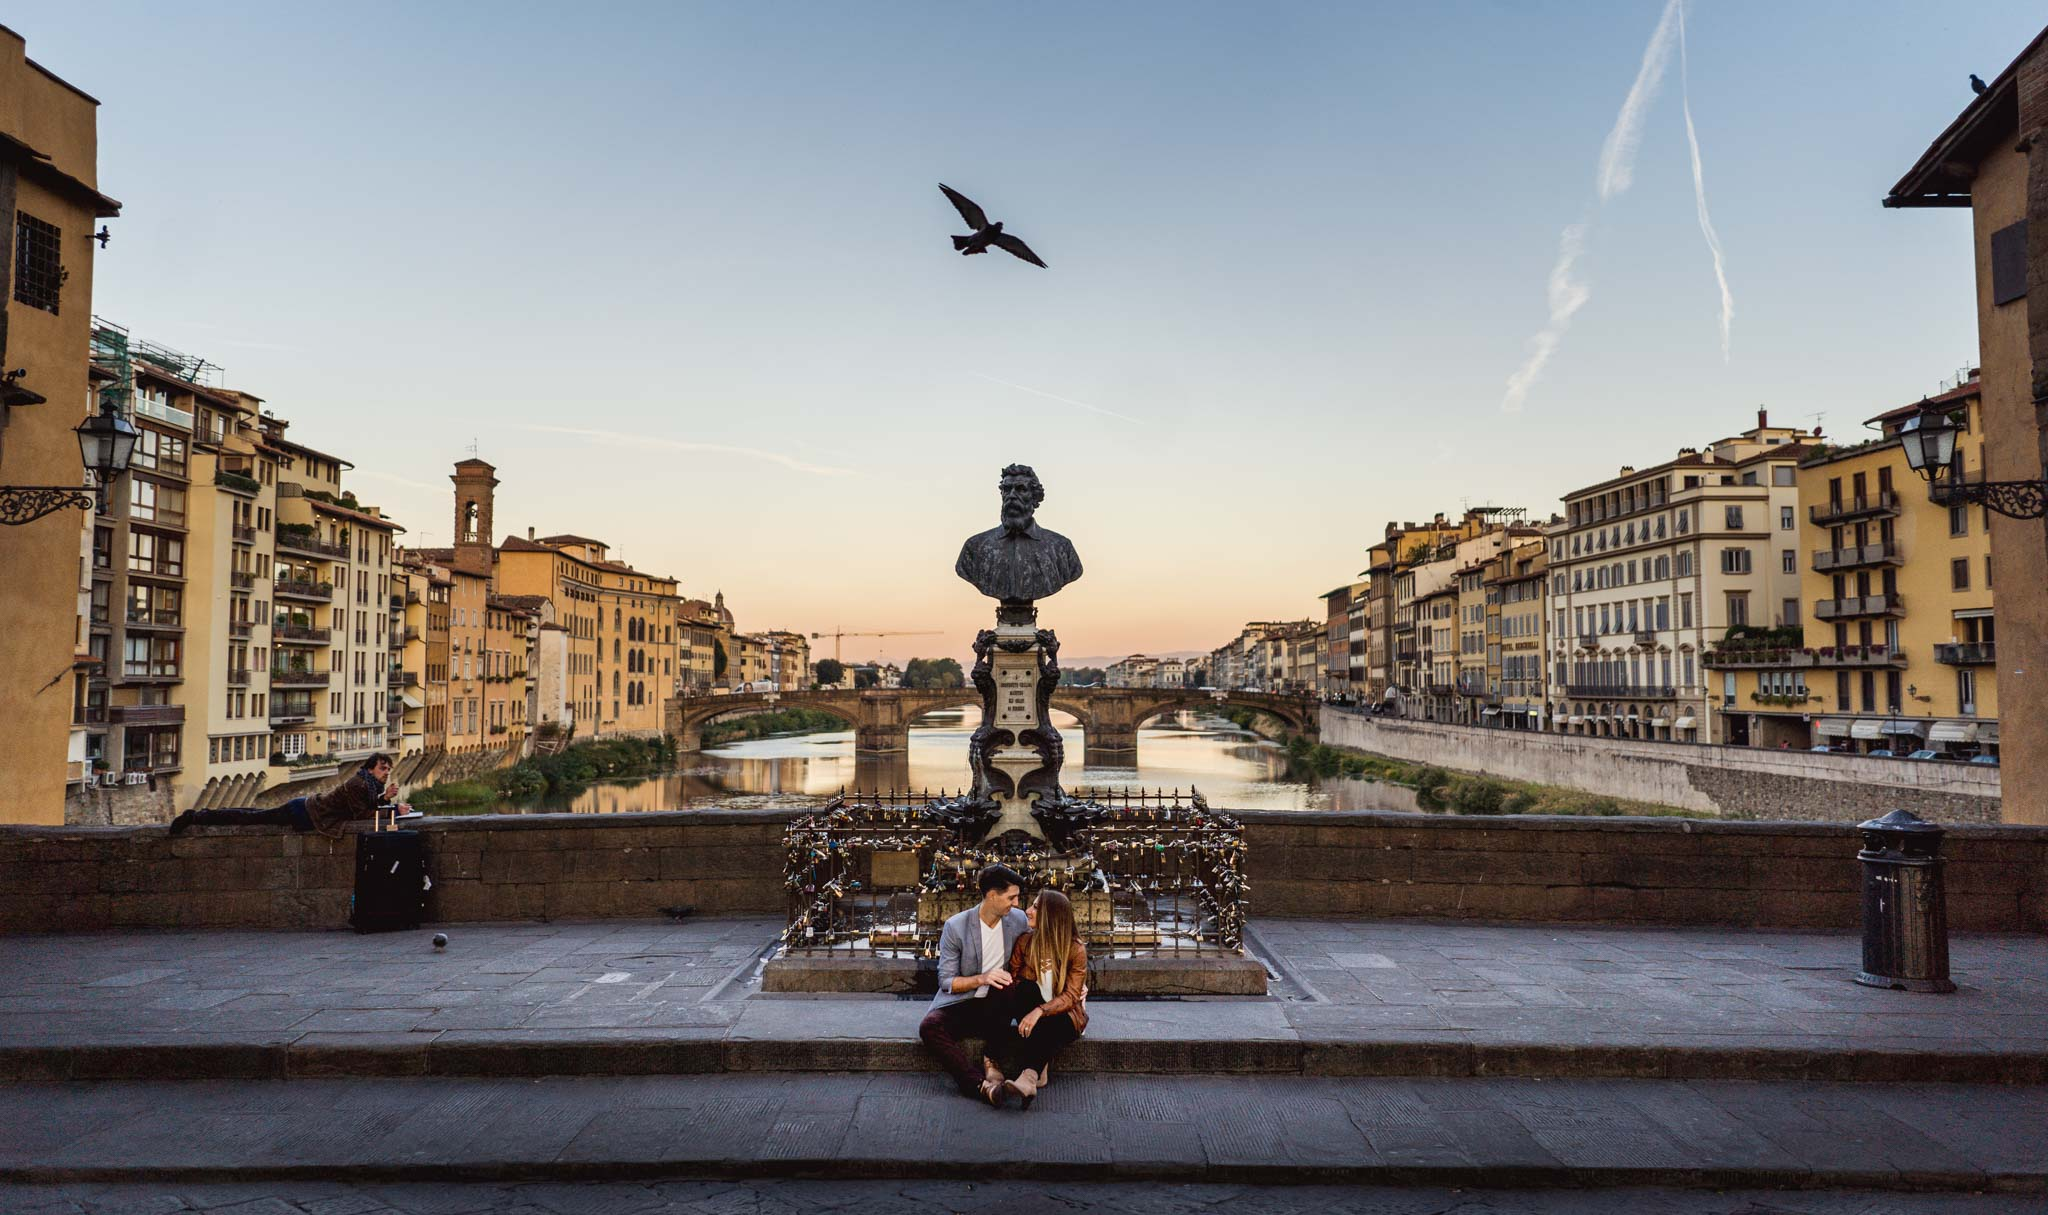 engagement photography creative portrait florence tuscany